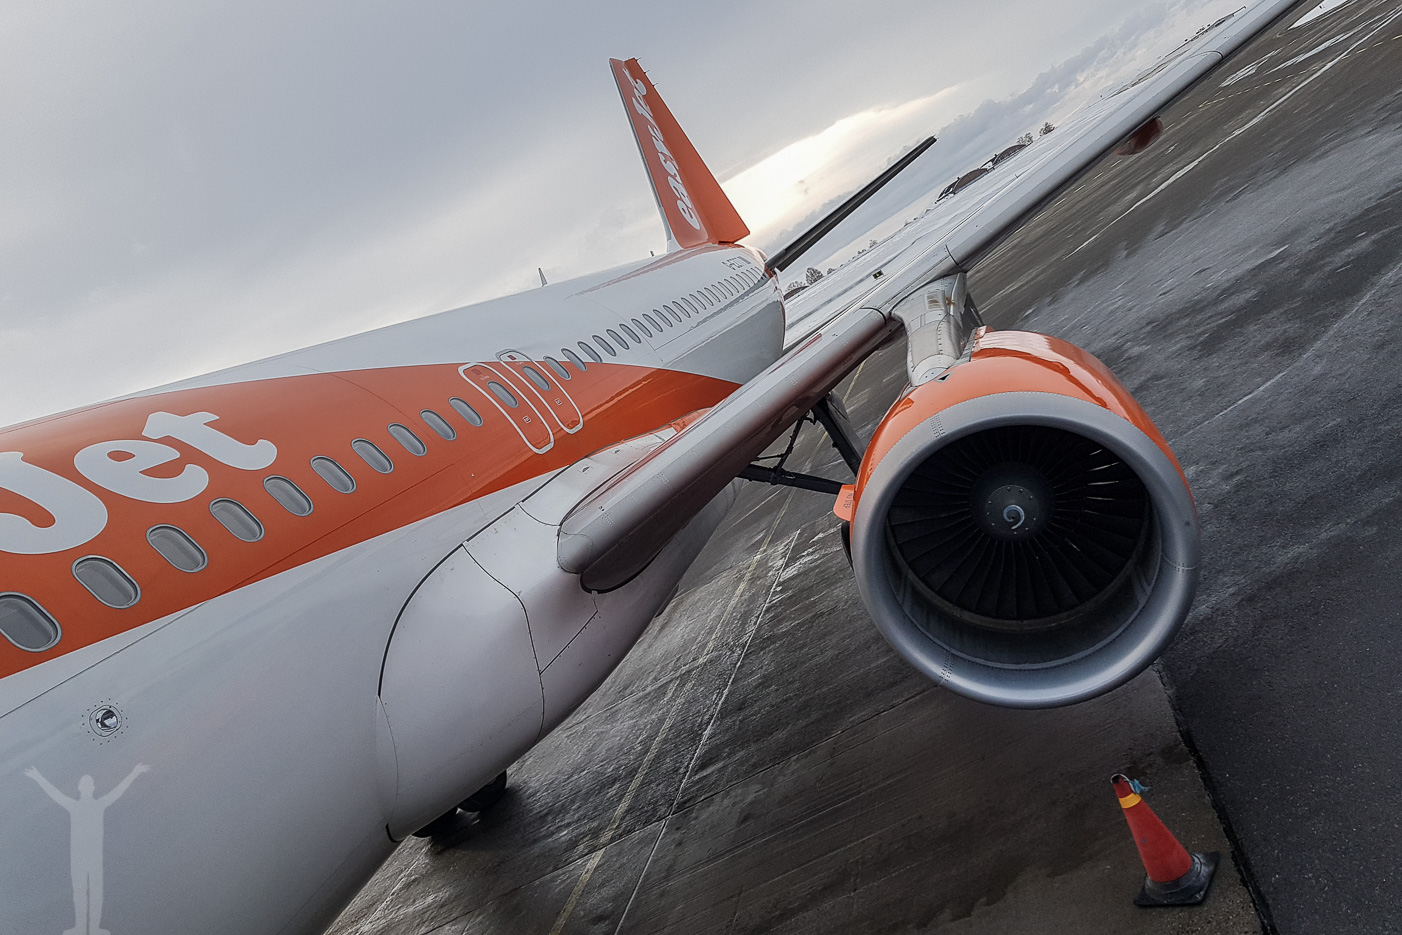 Airbus A320-214 (G-EZTT)